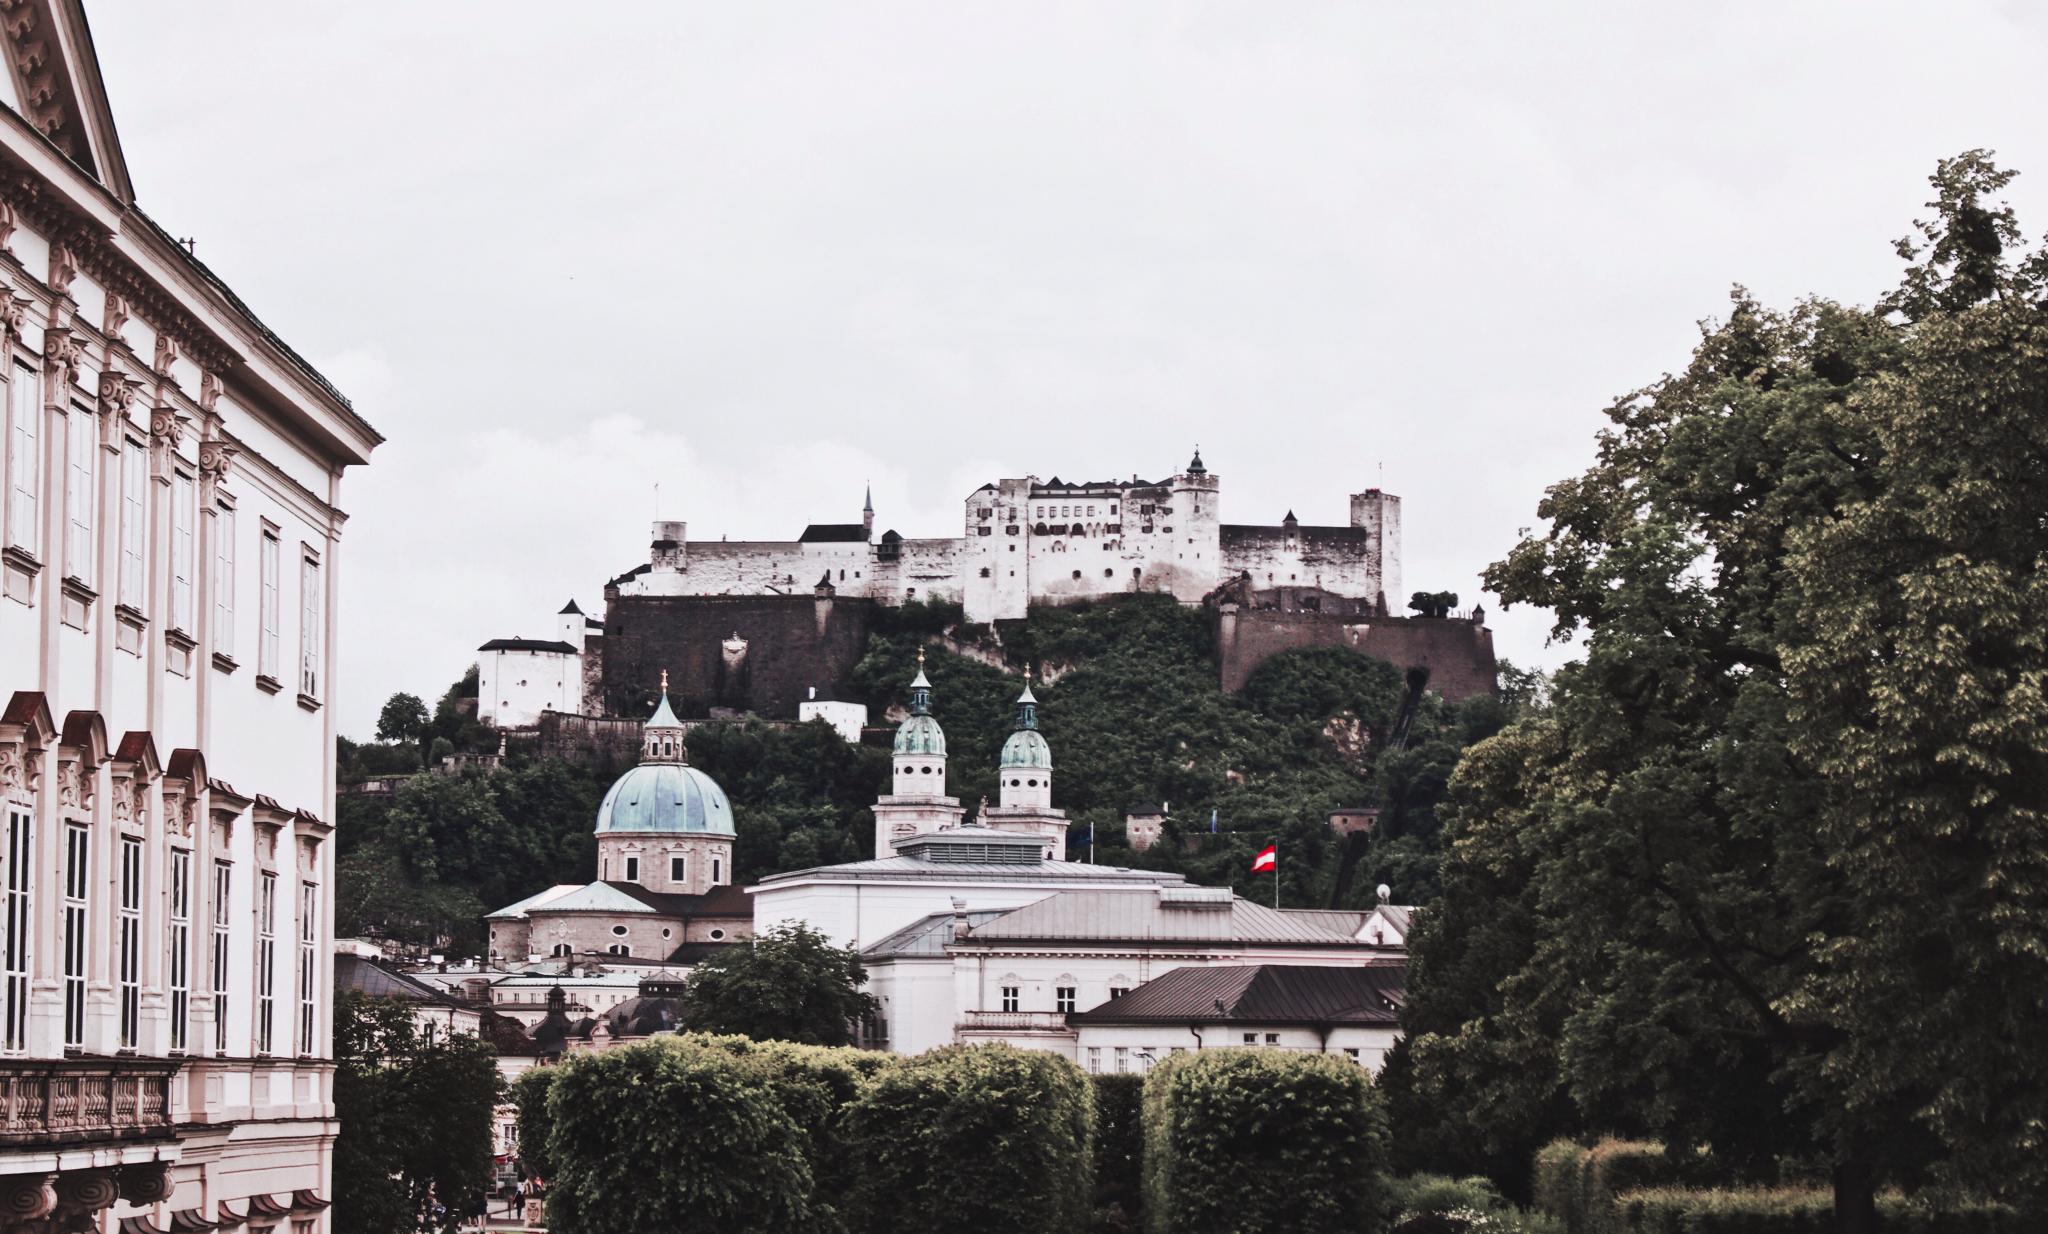 Mirabell Palace Garden, Salzburg Fortress